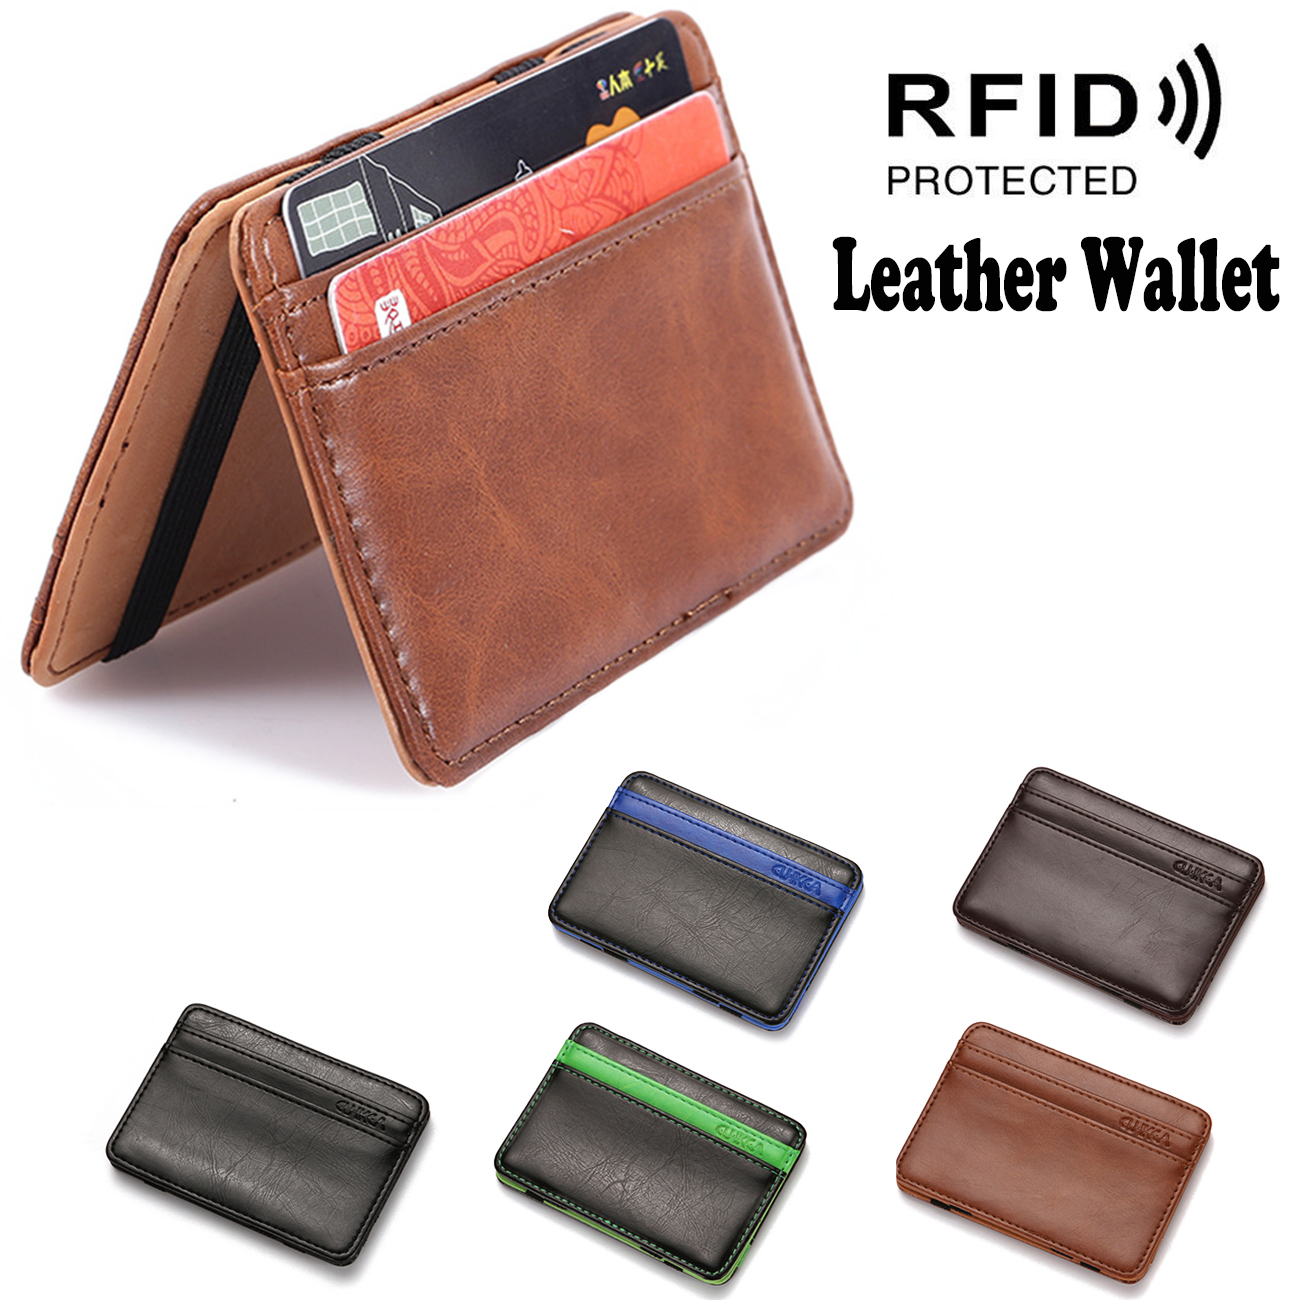 Men/'s Leather Magic Money Slim Wallet ID Credit Card Holder Case Purse Brown